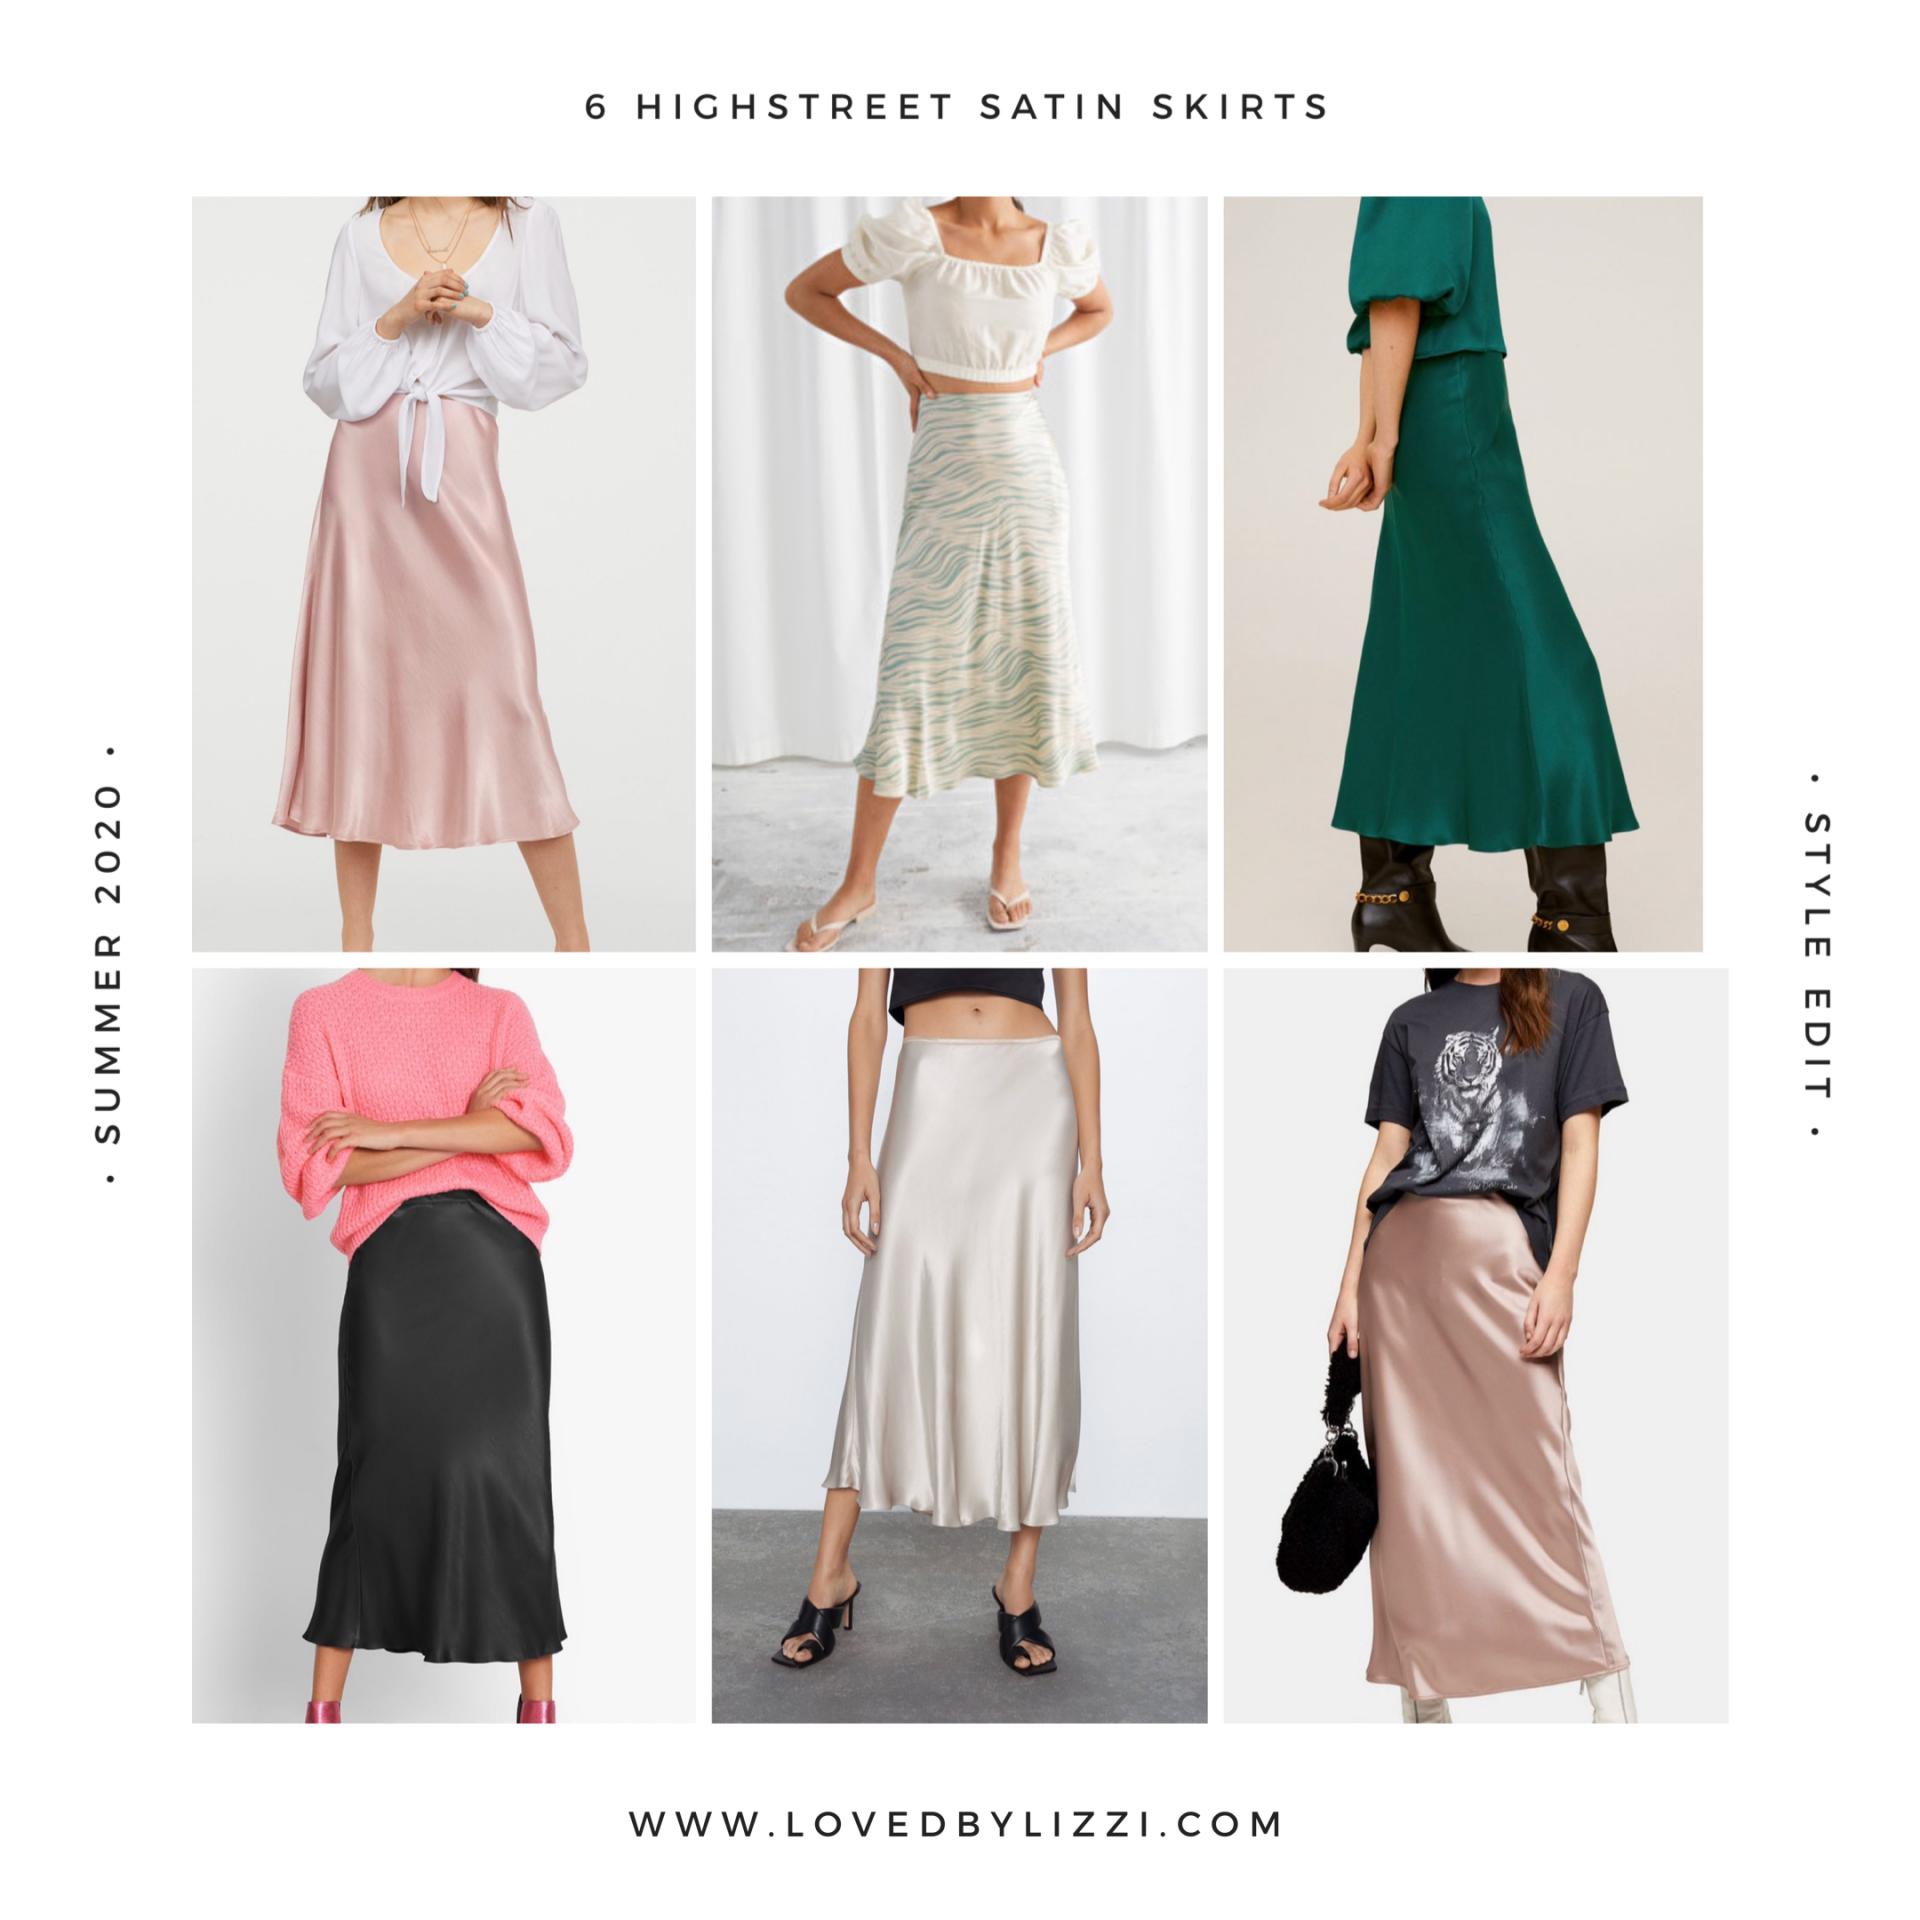 6 Versatile Satin Slip Skirts